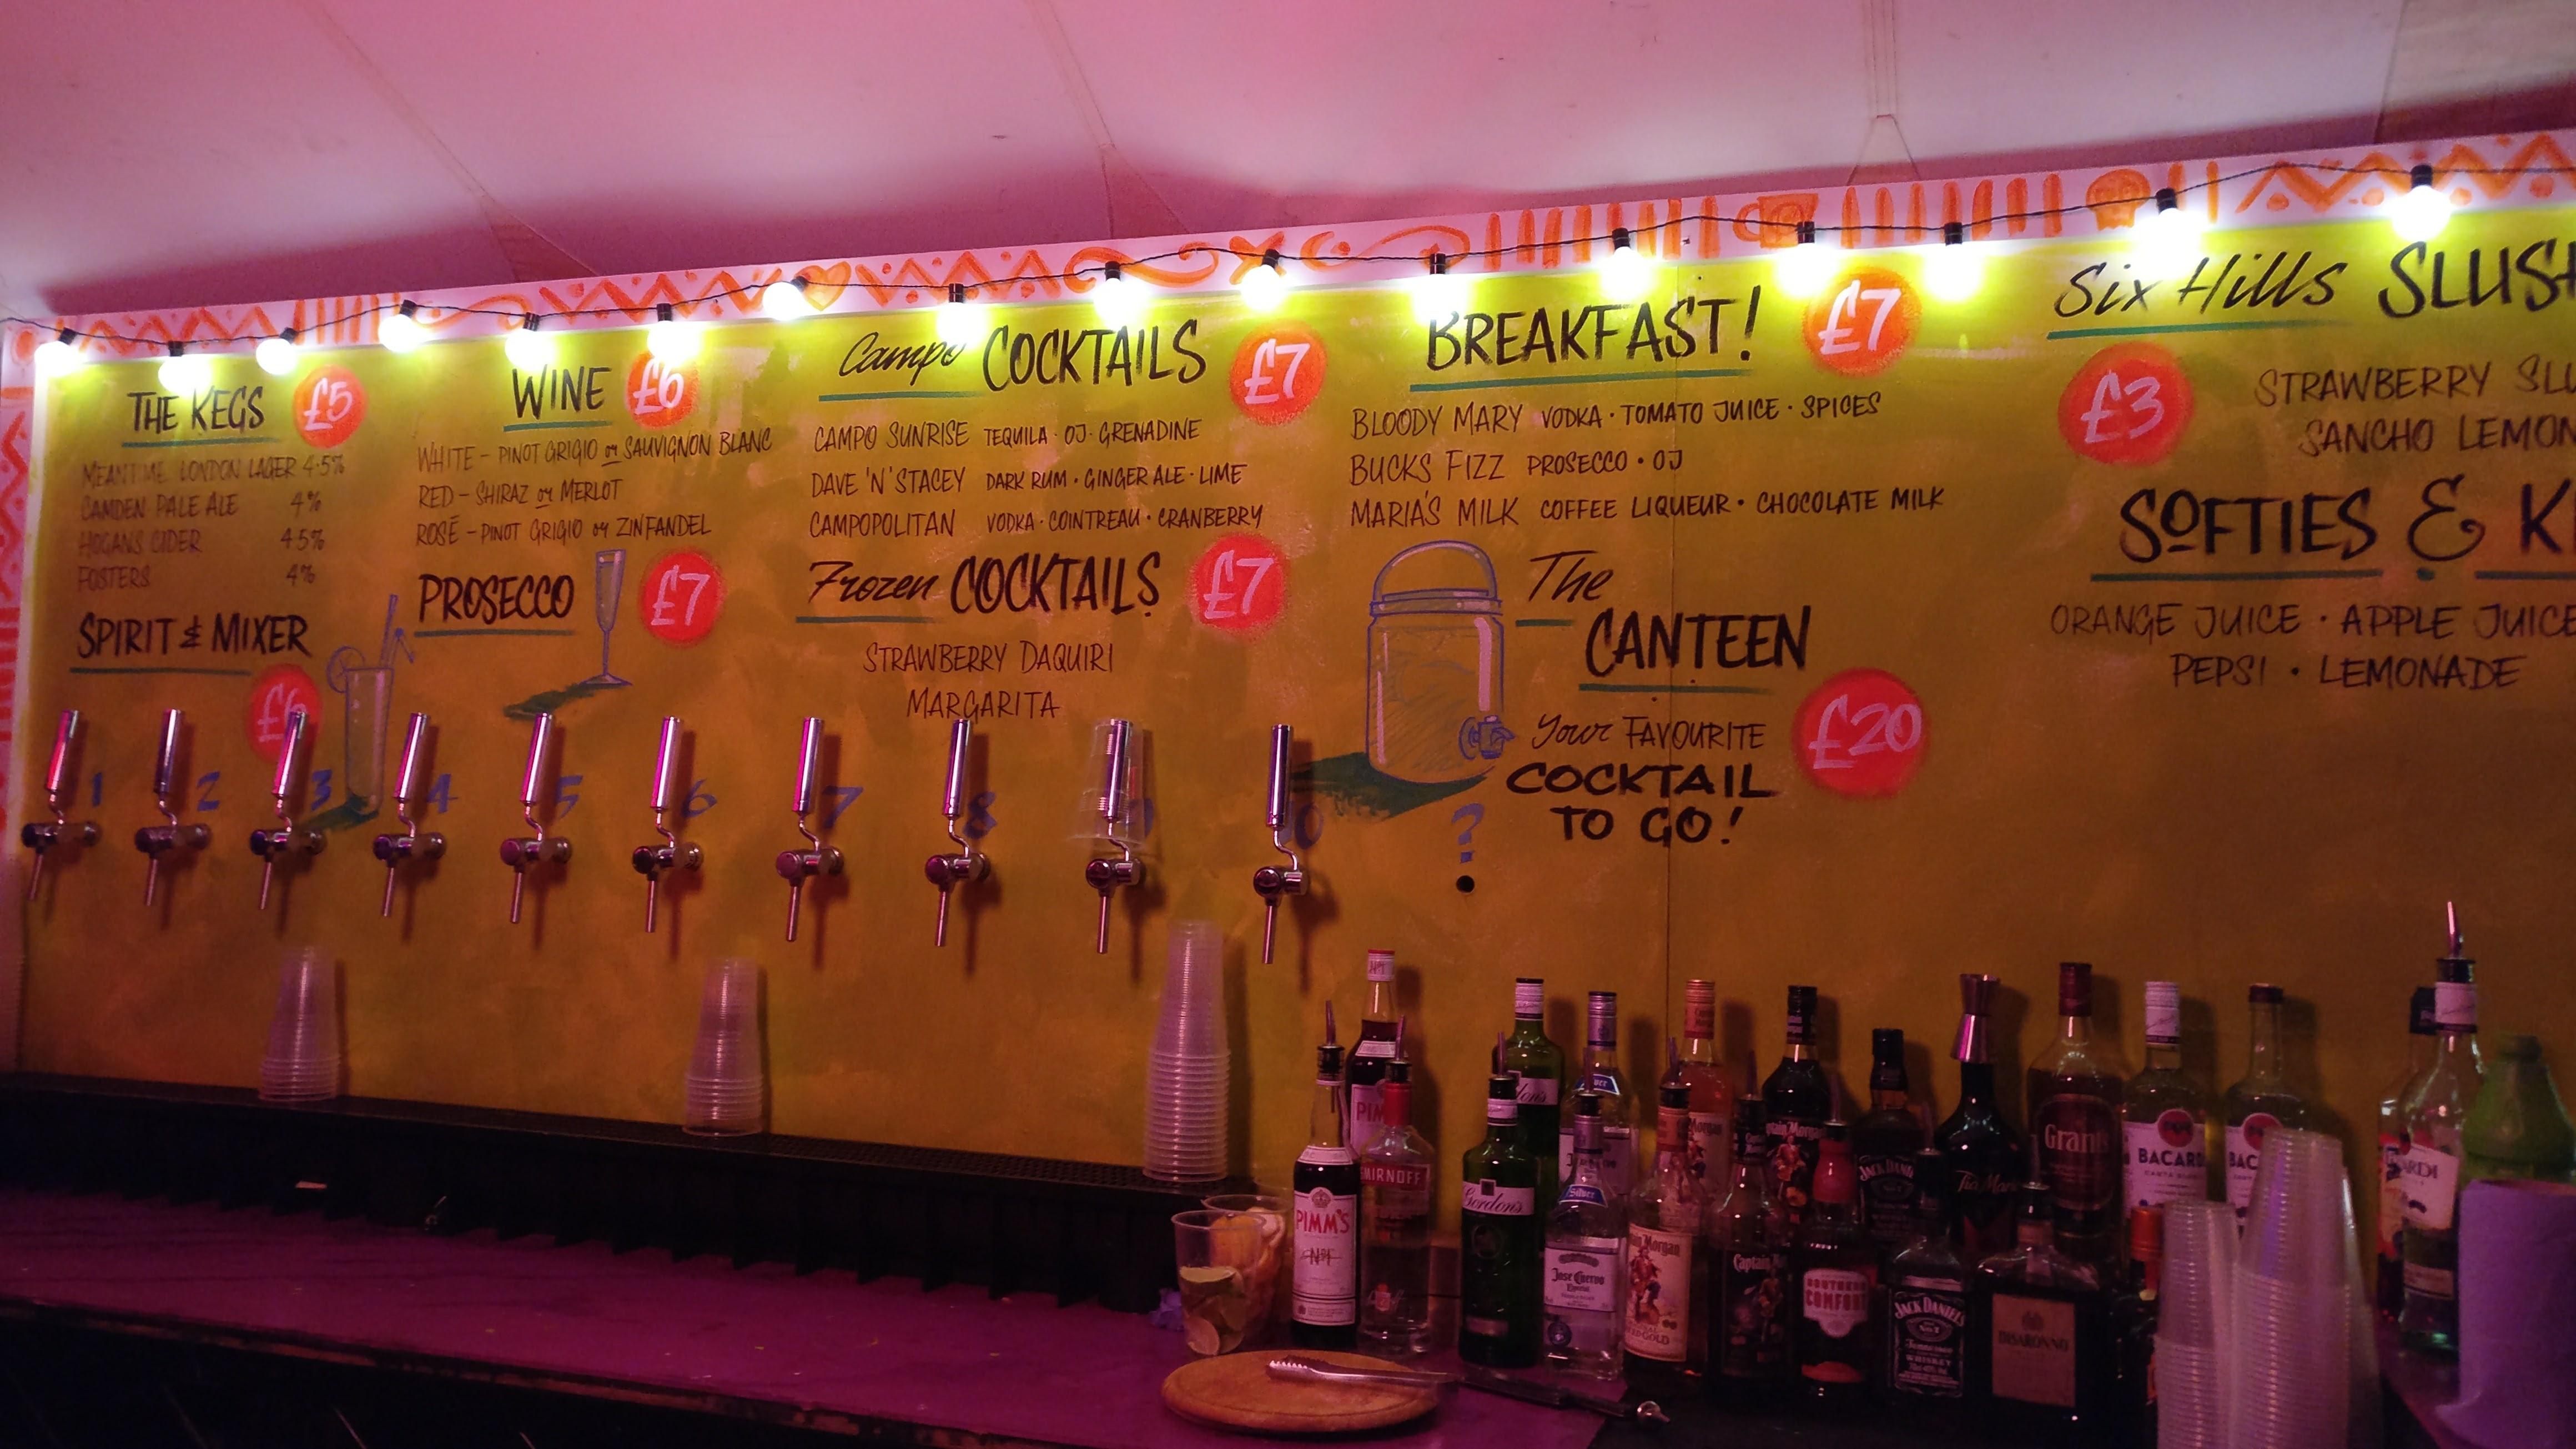 Festival bar menu